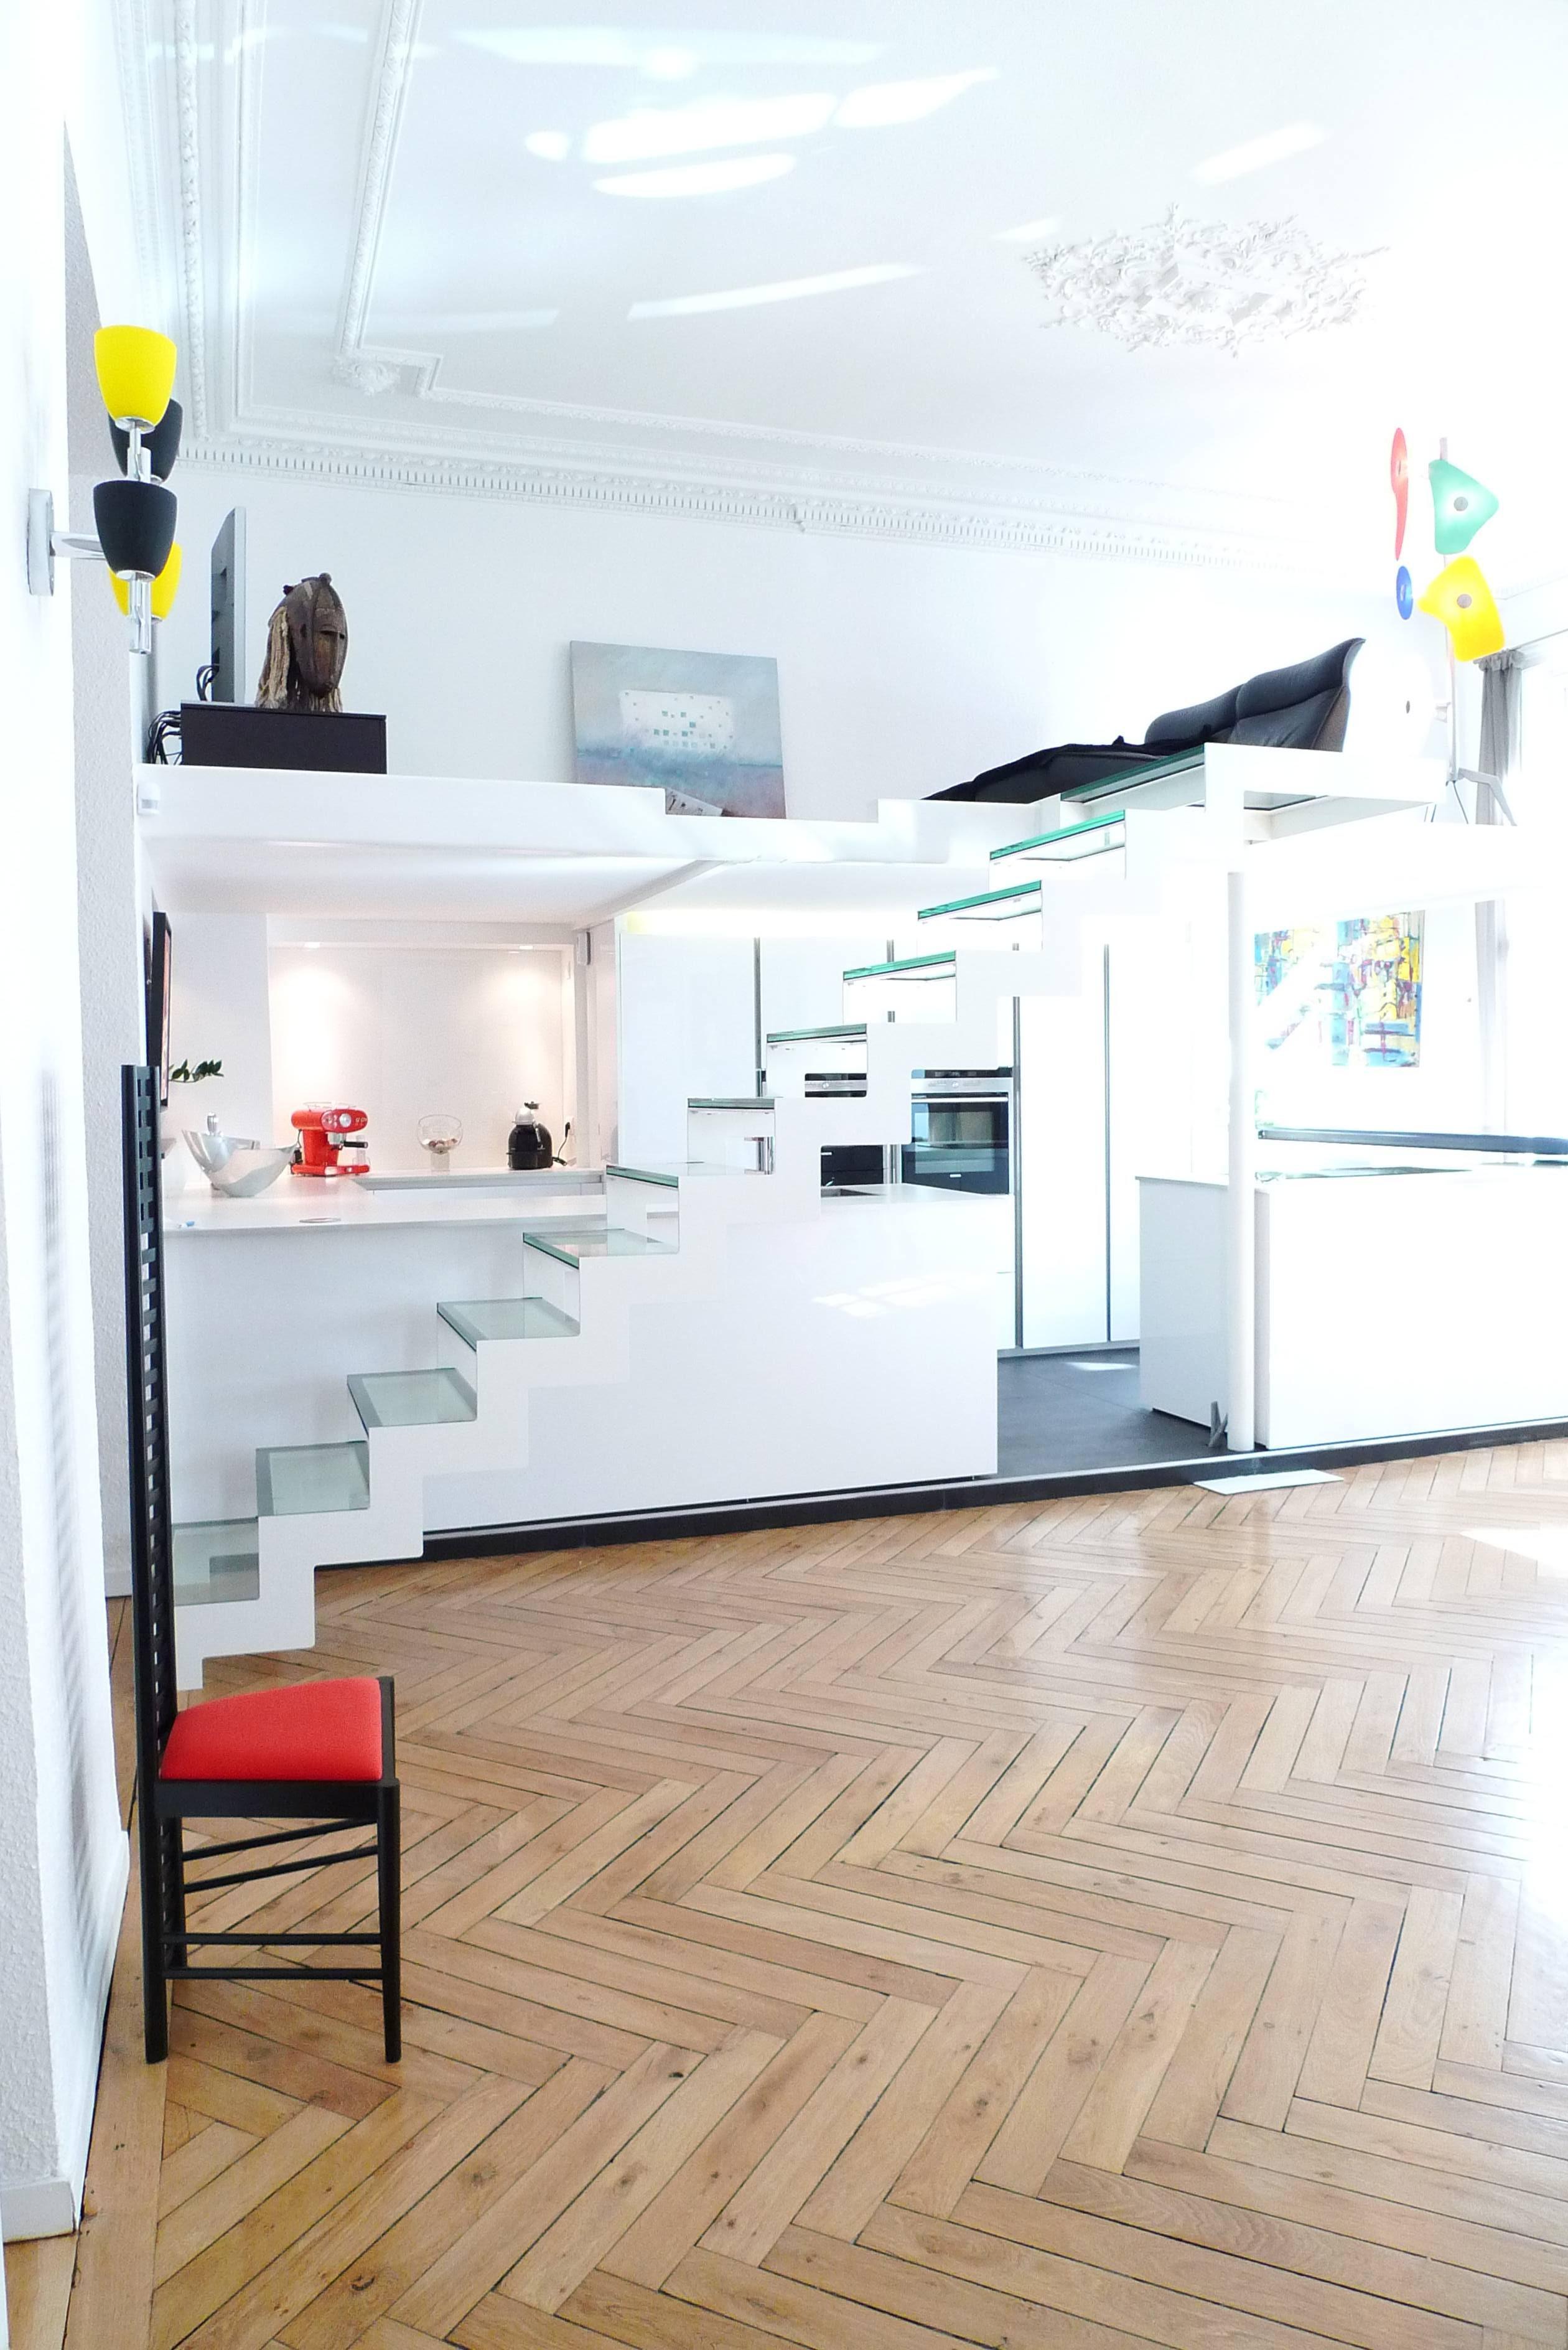 rbconcept-appartement-bourgeois-mezzanine